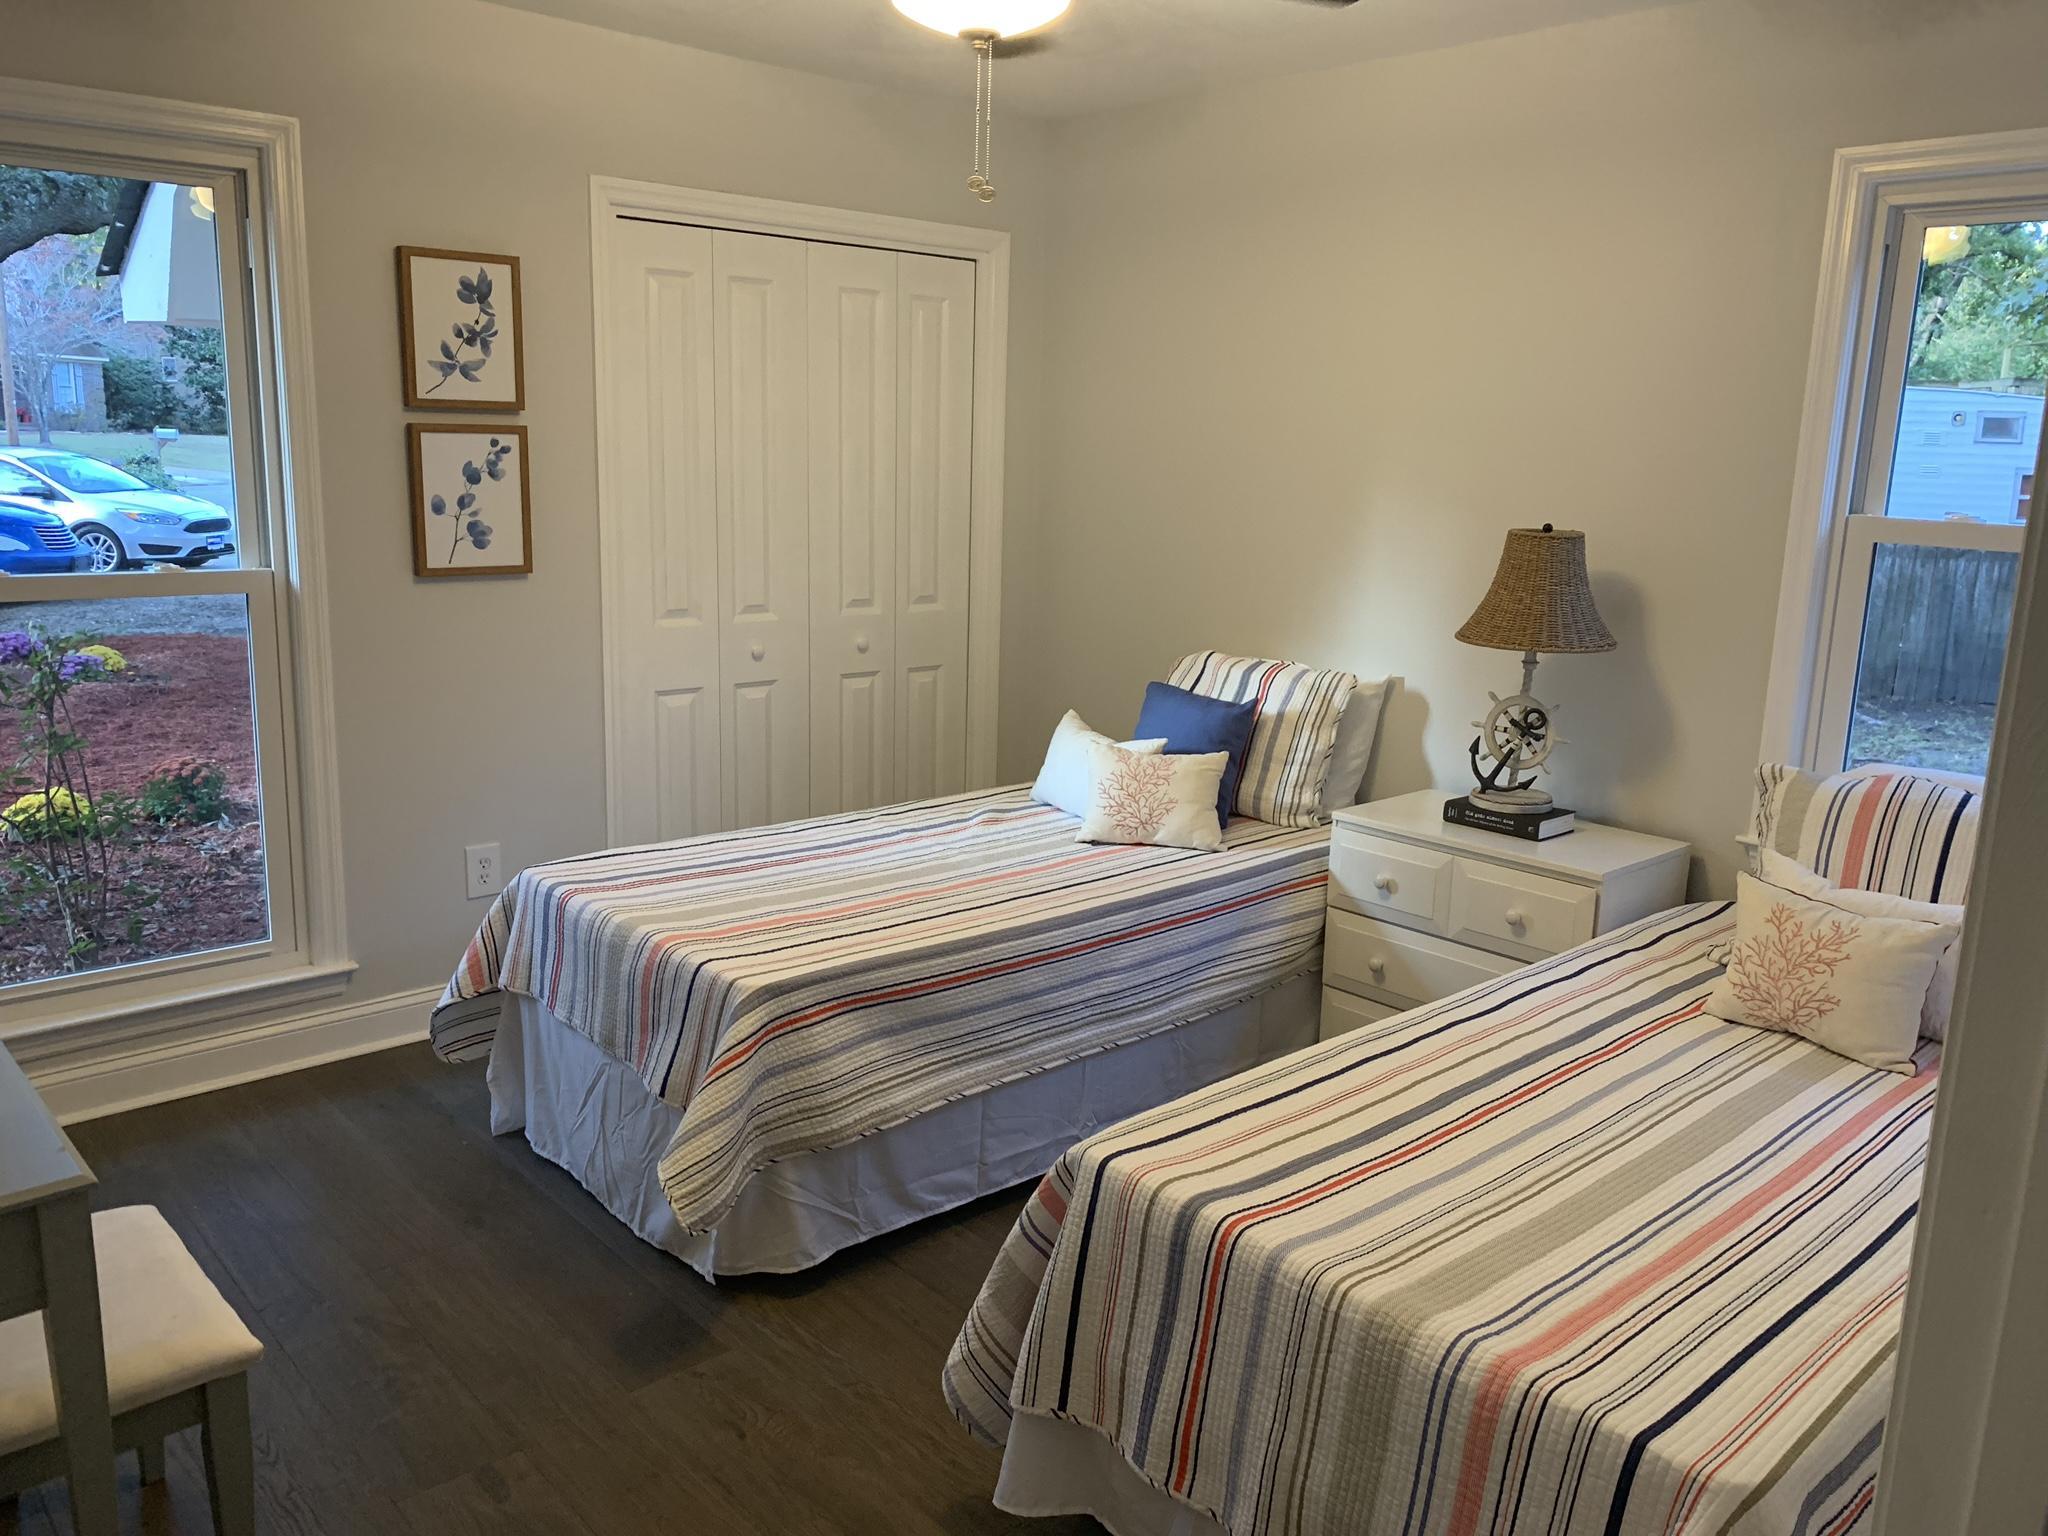 Heathwood Ext Homes For Sale - 2 Blaine, Charleston, SC - 5